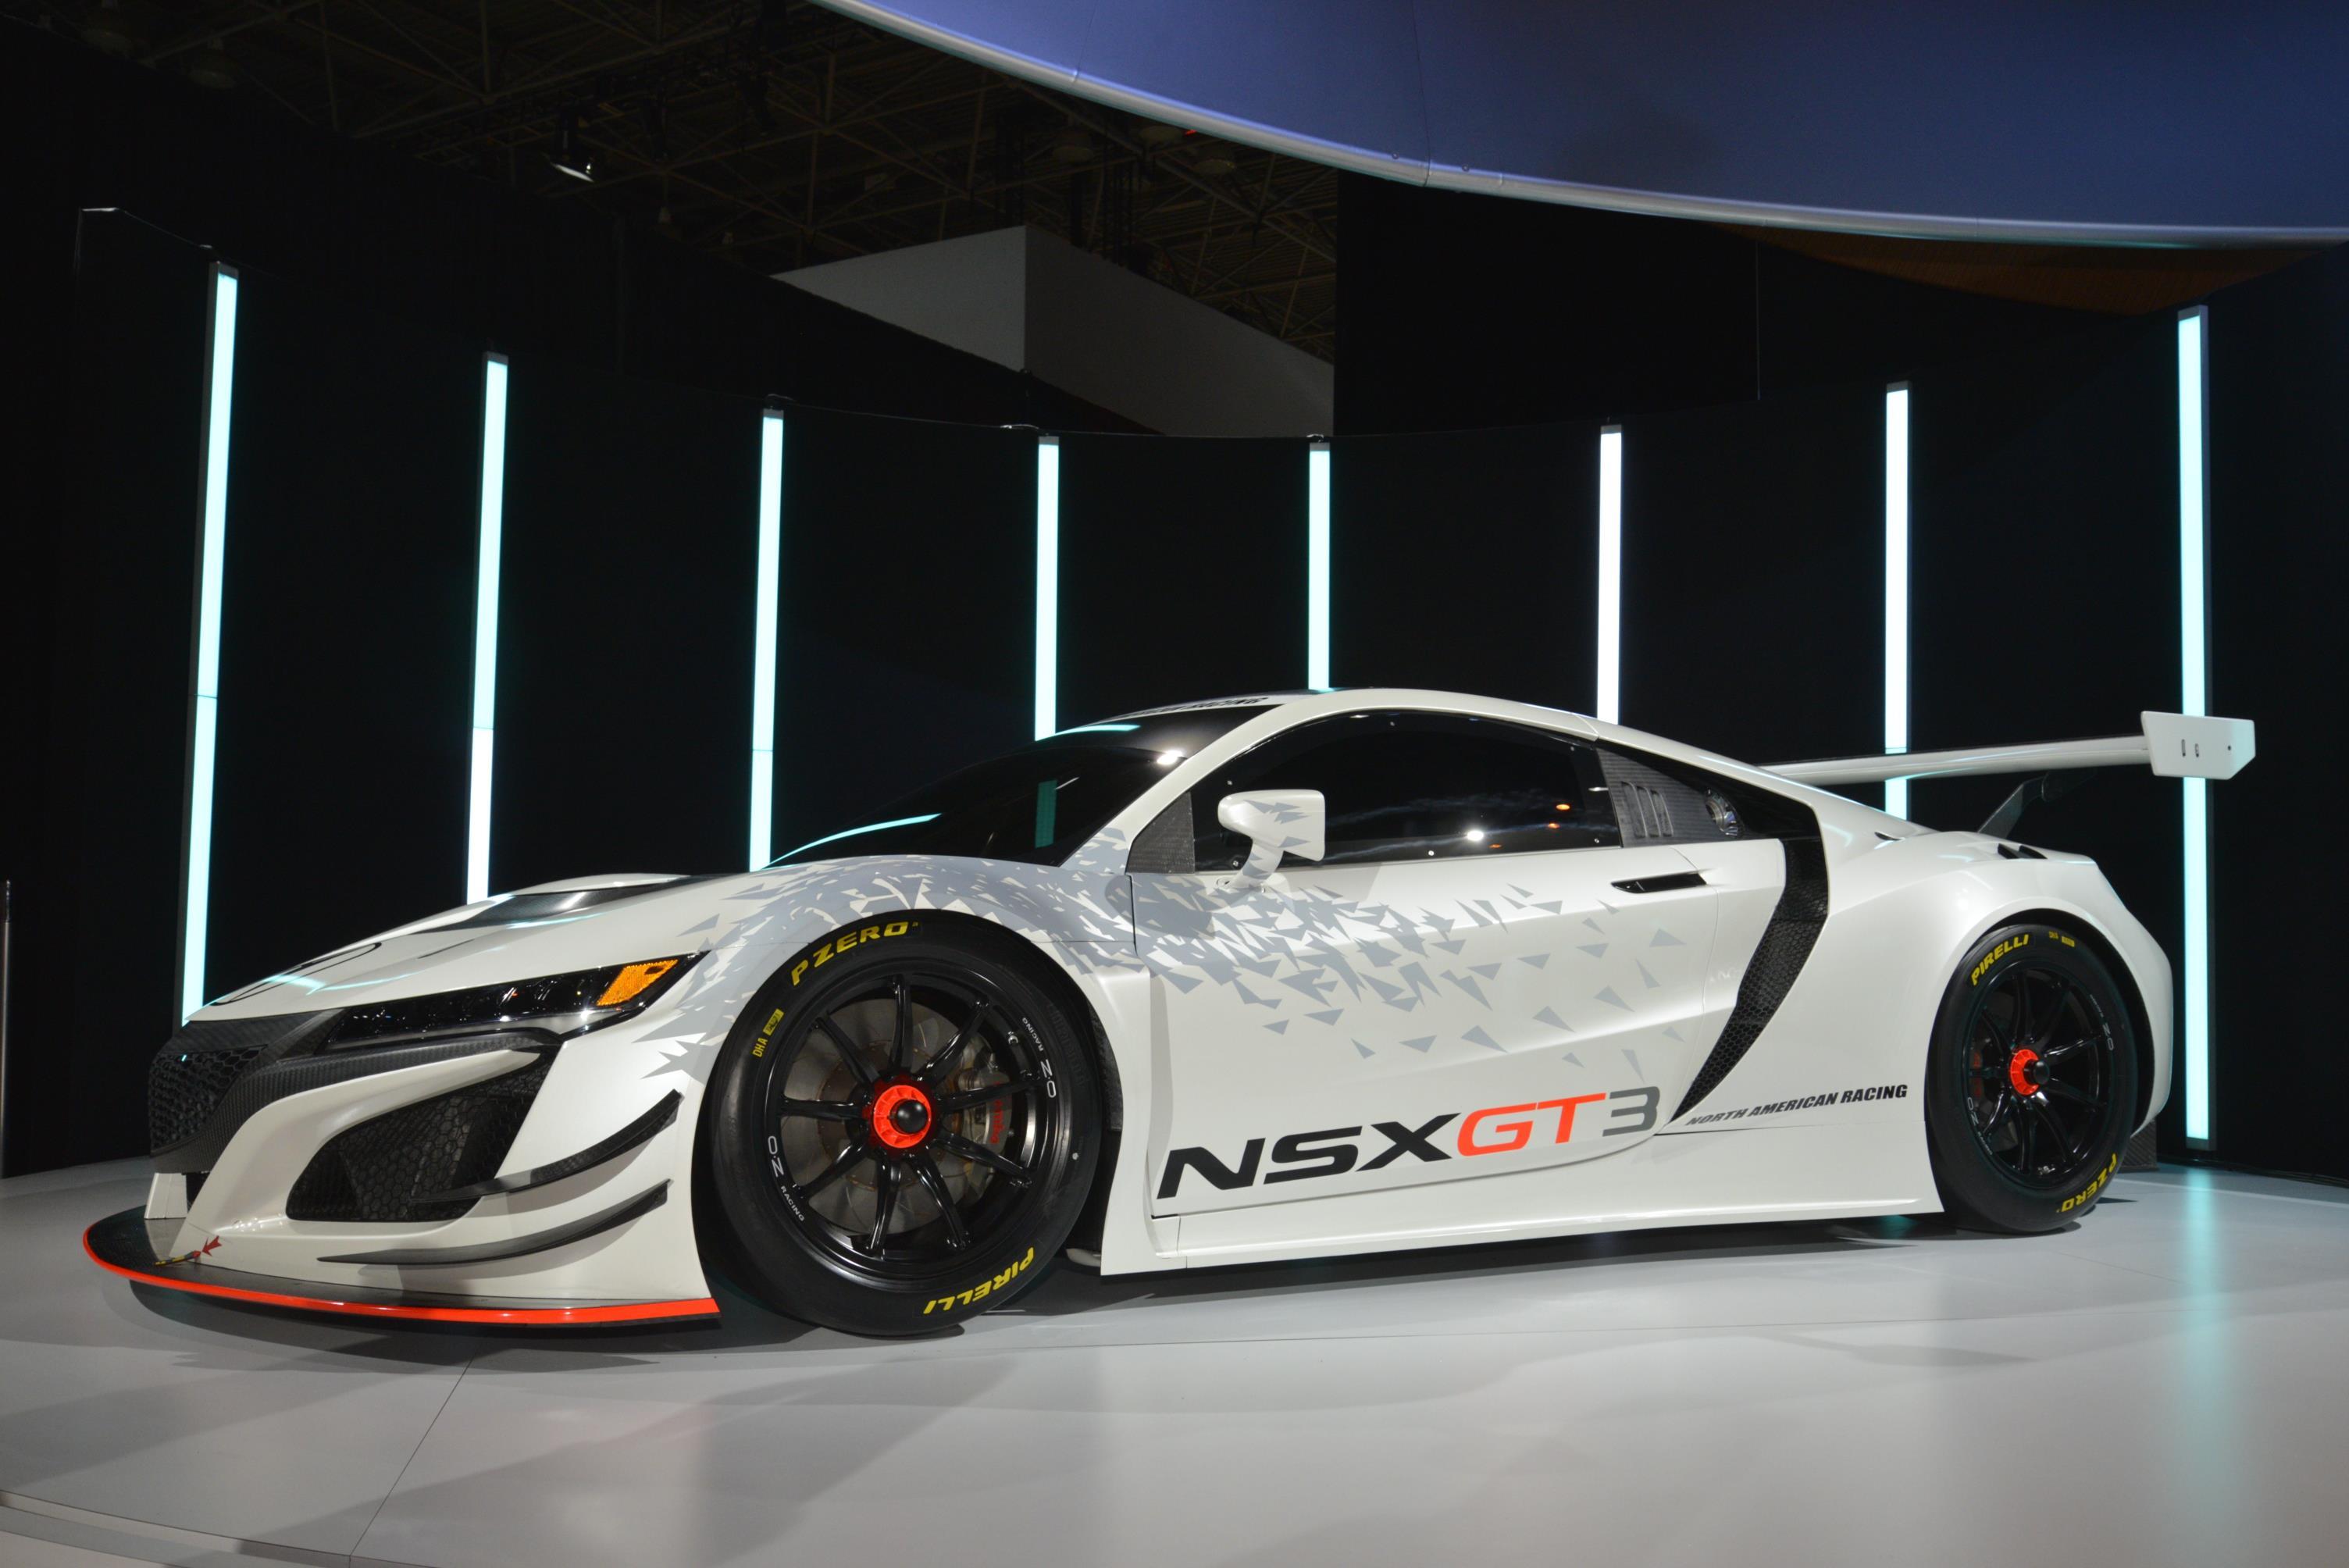 Acura Nsx Gt3 Hits New York As Pure Racecar No Hybrid